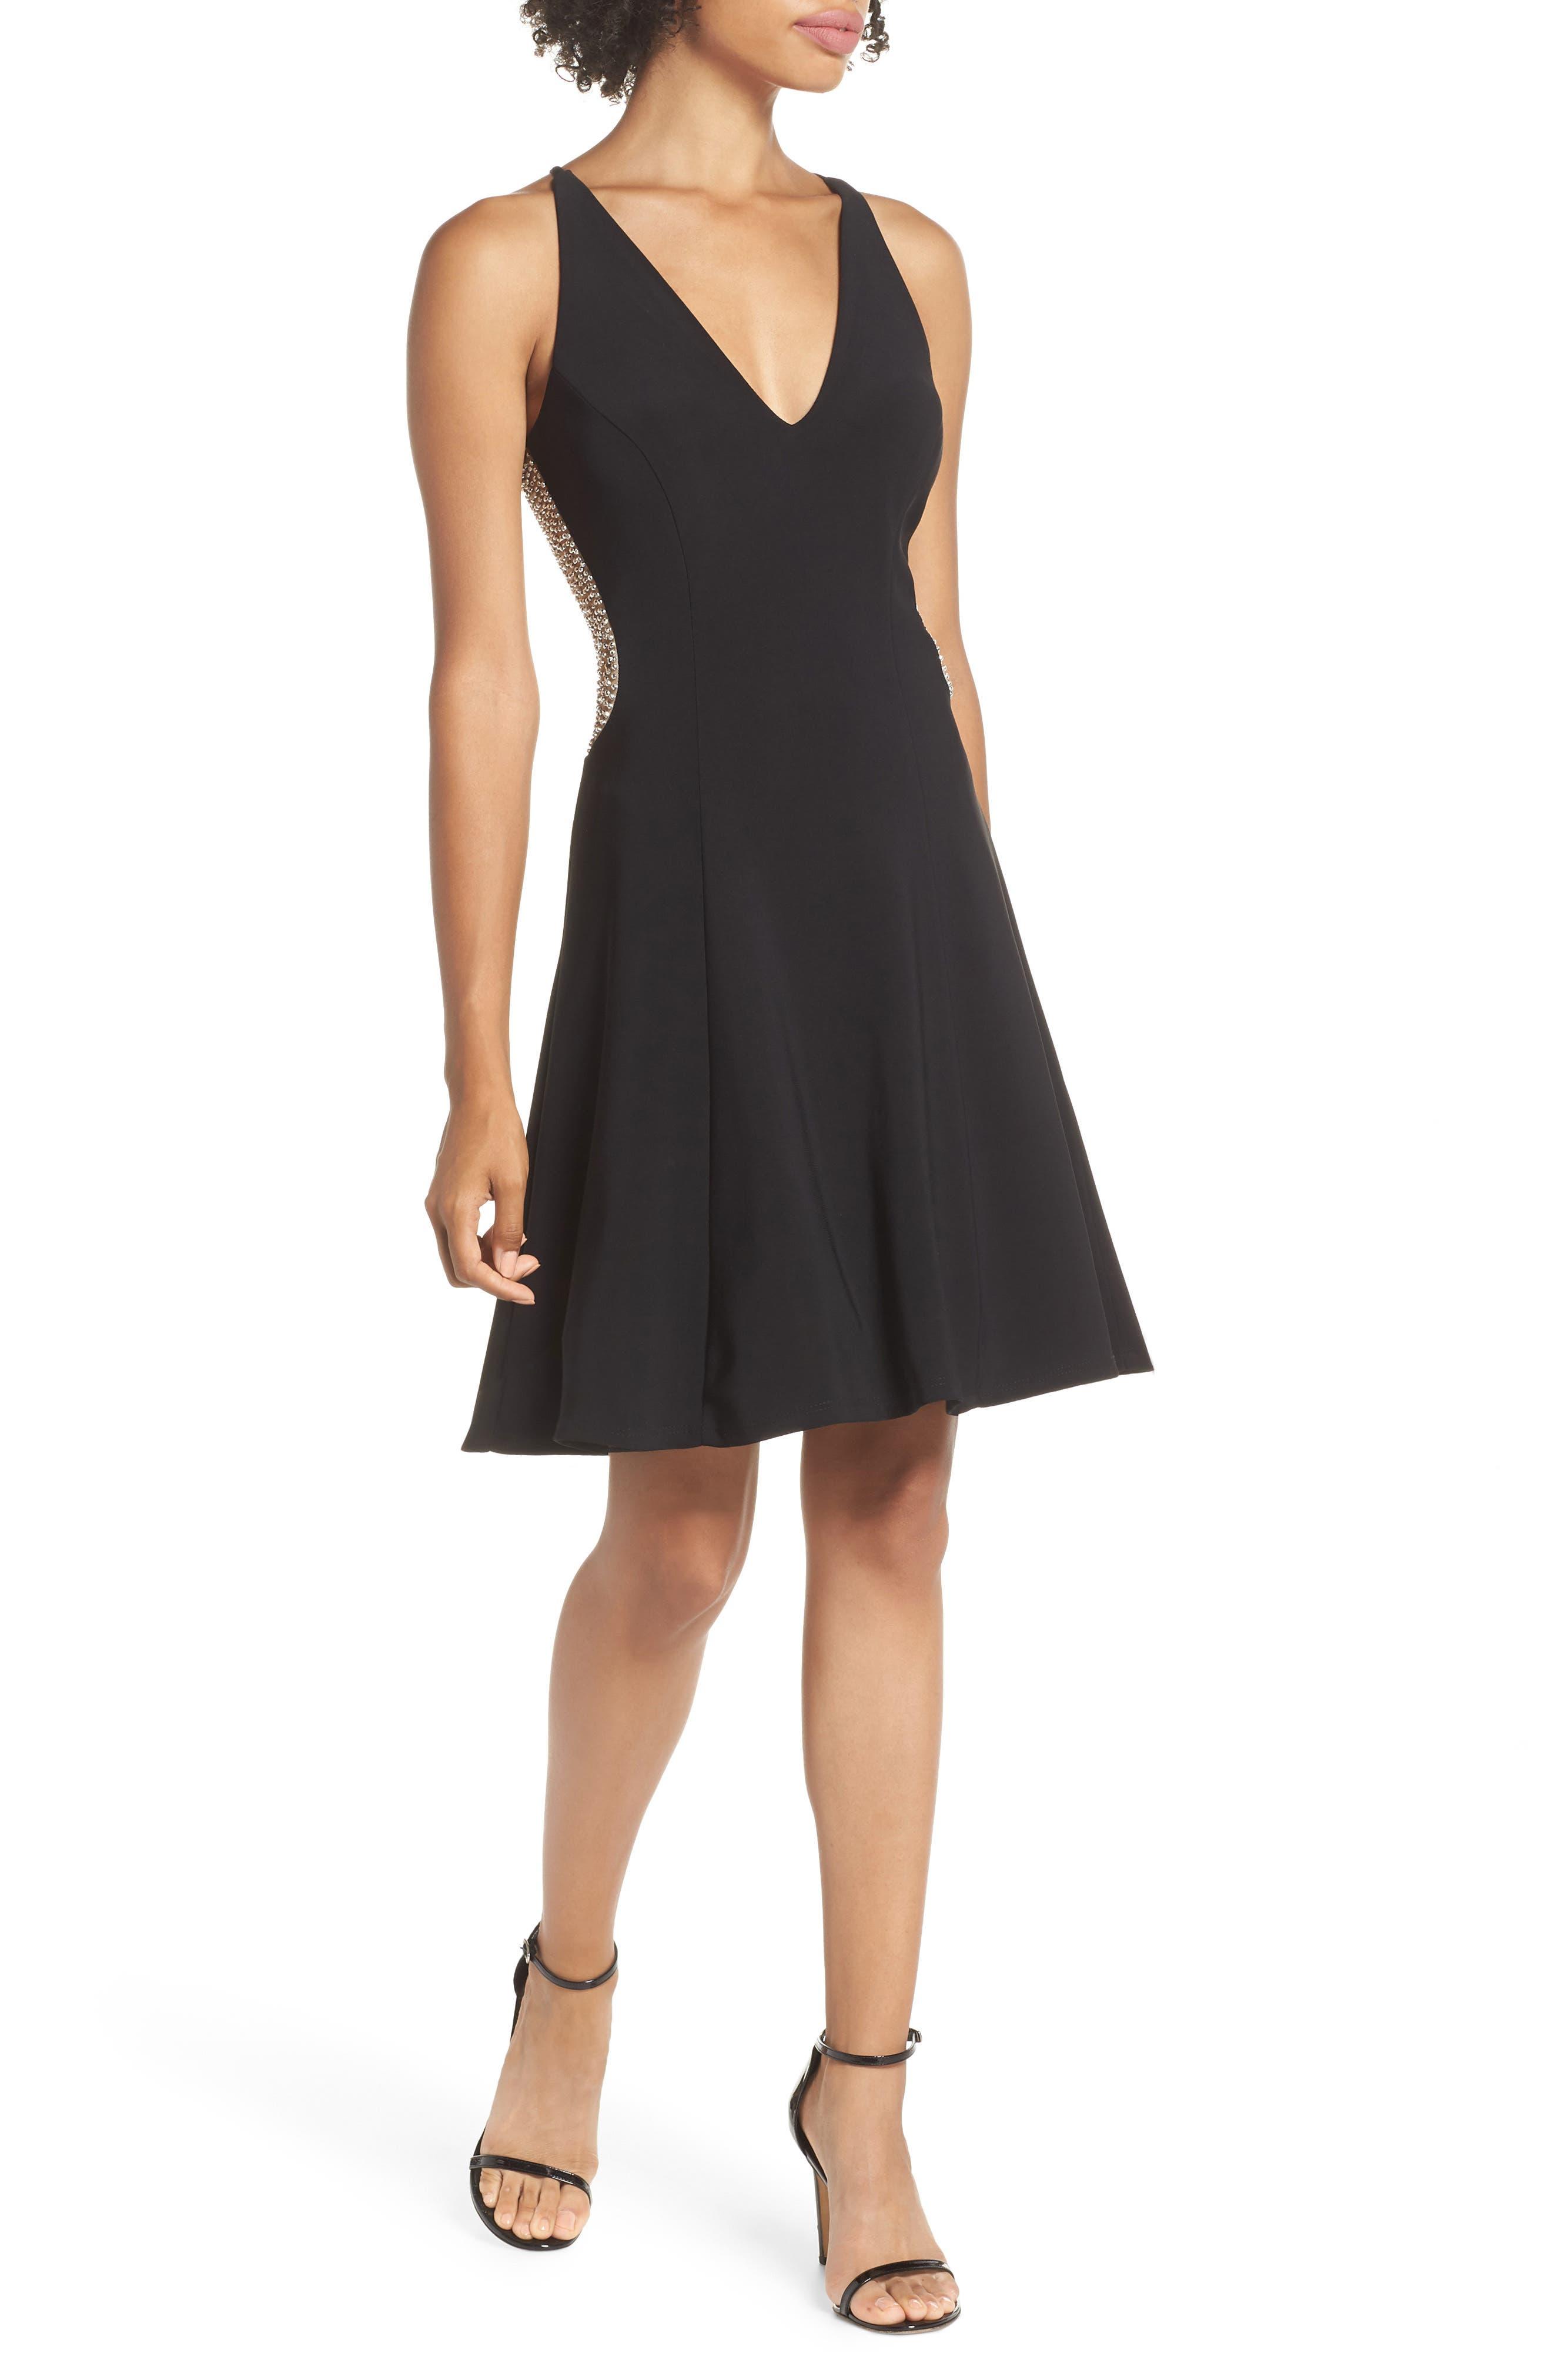 Deep V-Neck Skater Dress,                             Main thumbnail 1, color,                             BLACK/ / NUDE/ SILVER